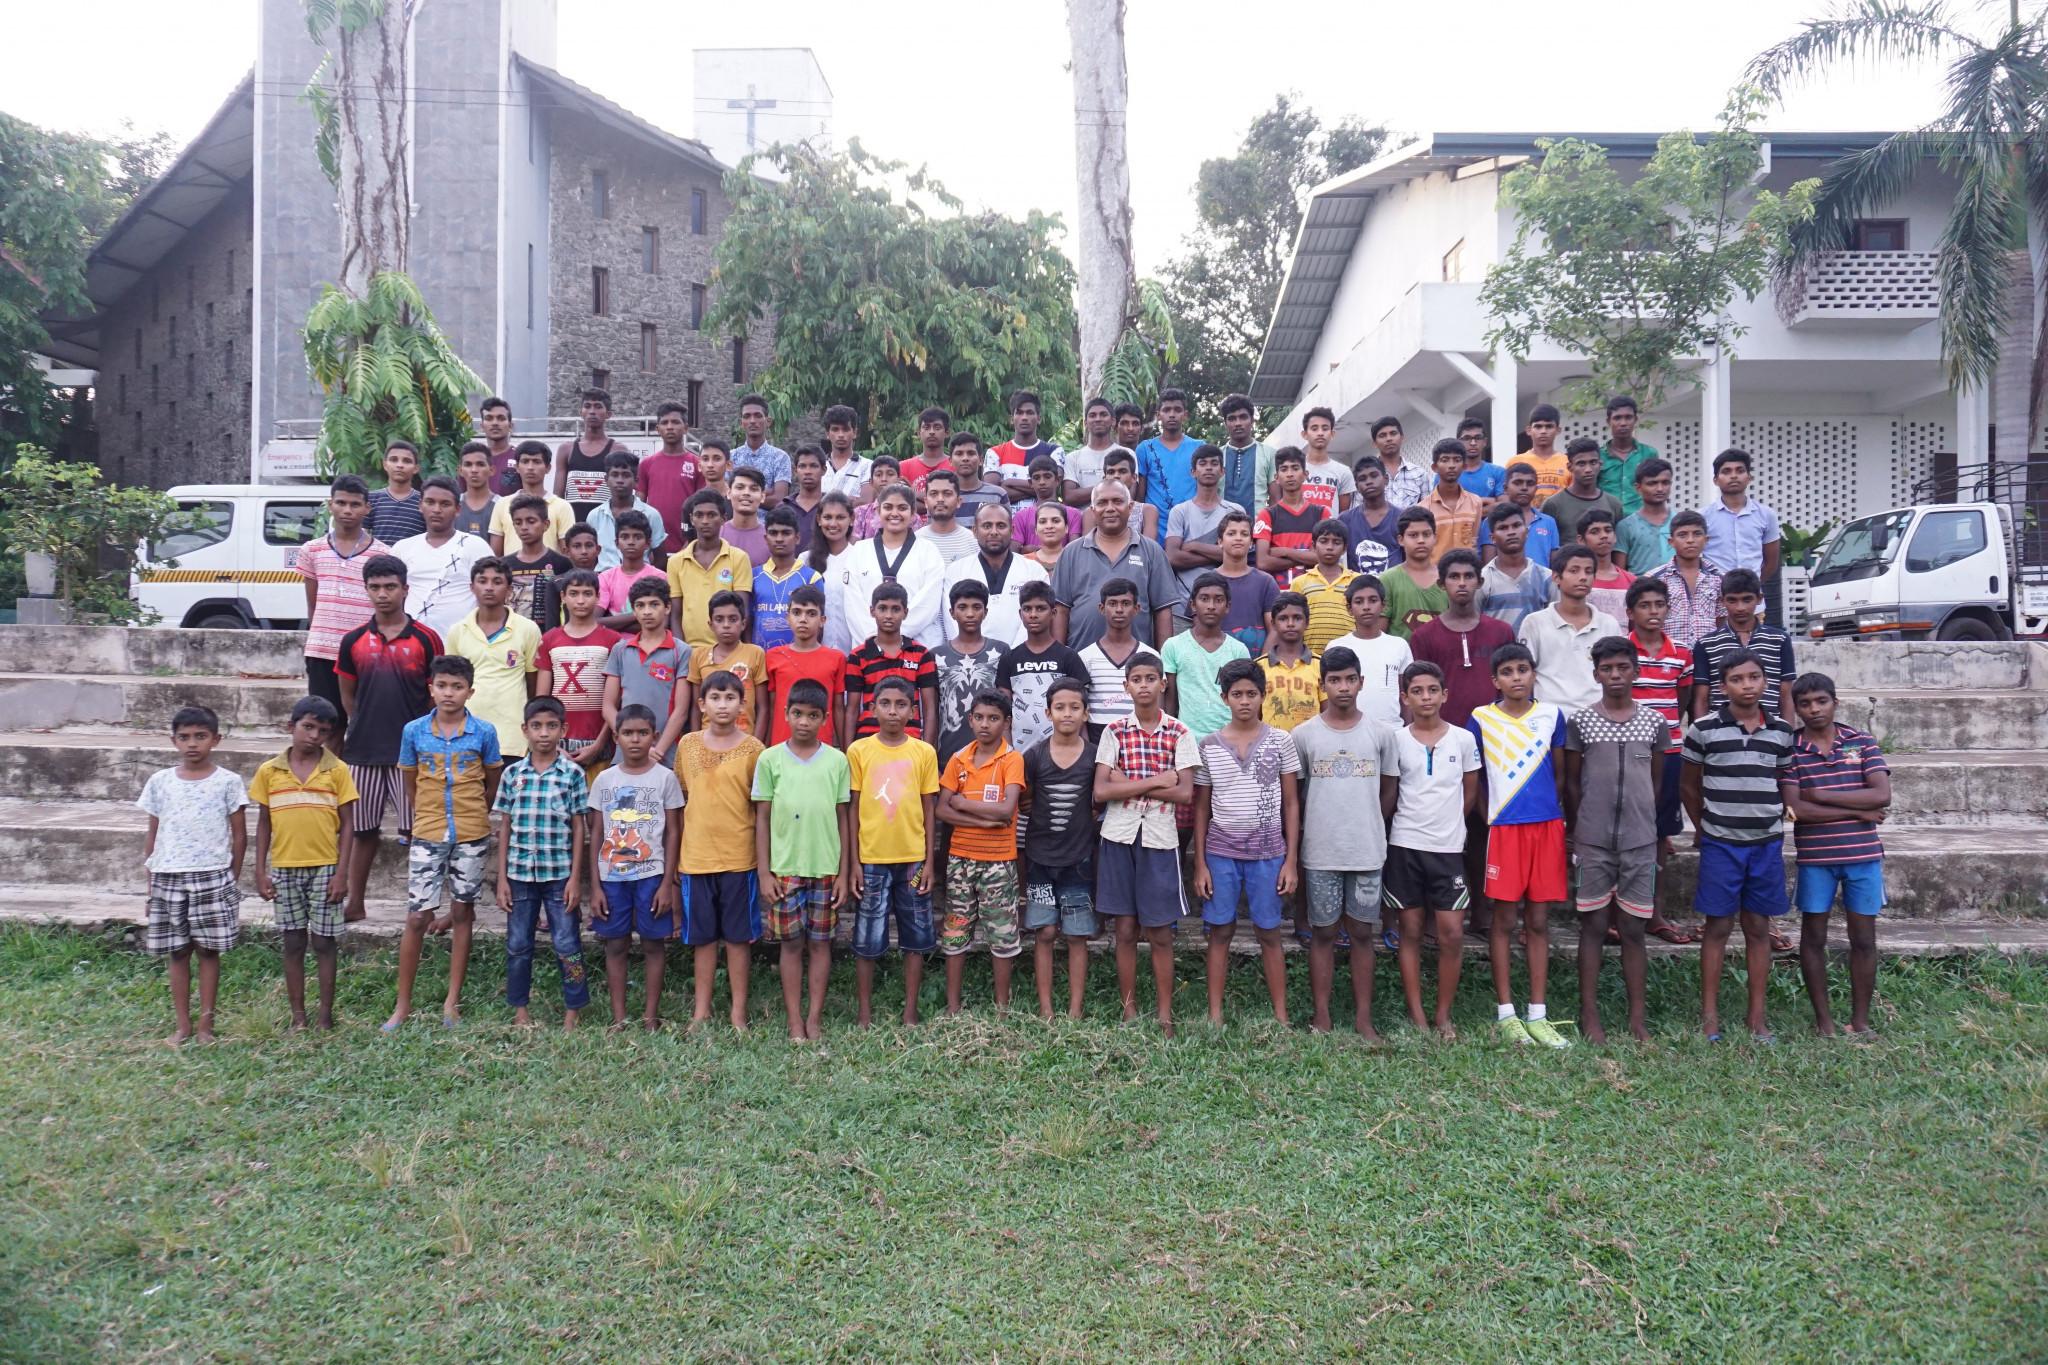 World Taekwondo Cares project on track in Sri Lanka